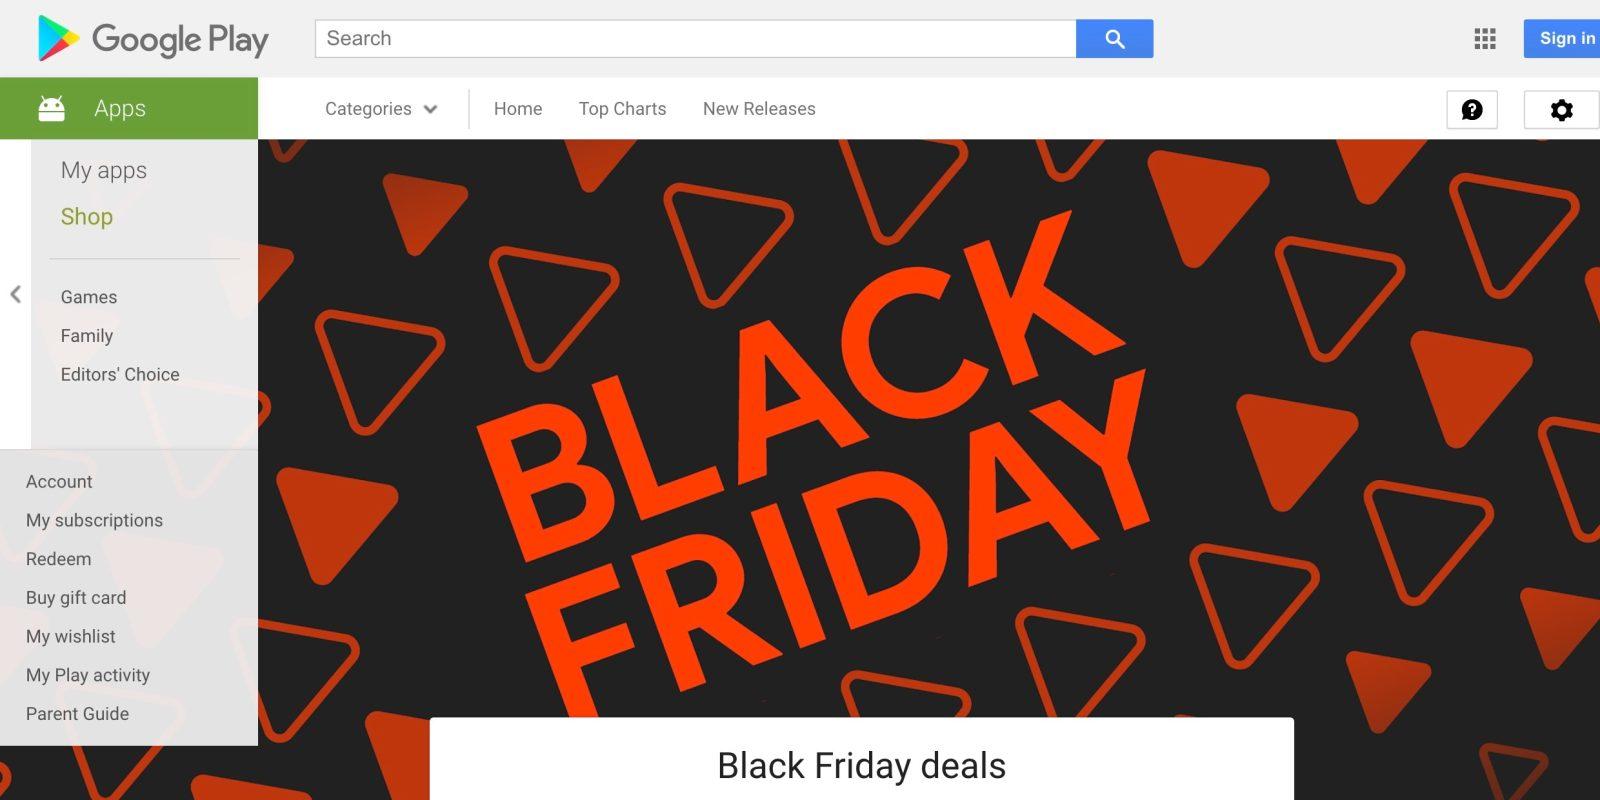 Ryddig Update: Live] Google Play Cyber Week includes a $.99 movie rental EI-04